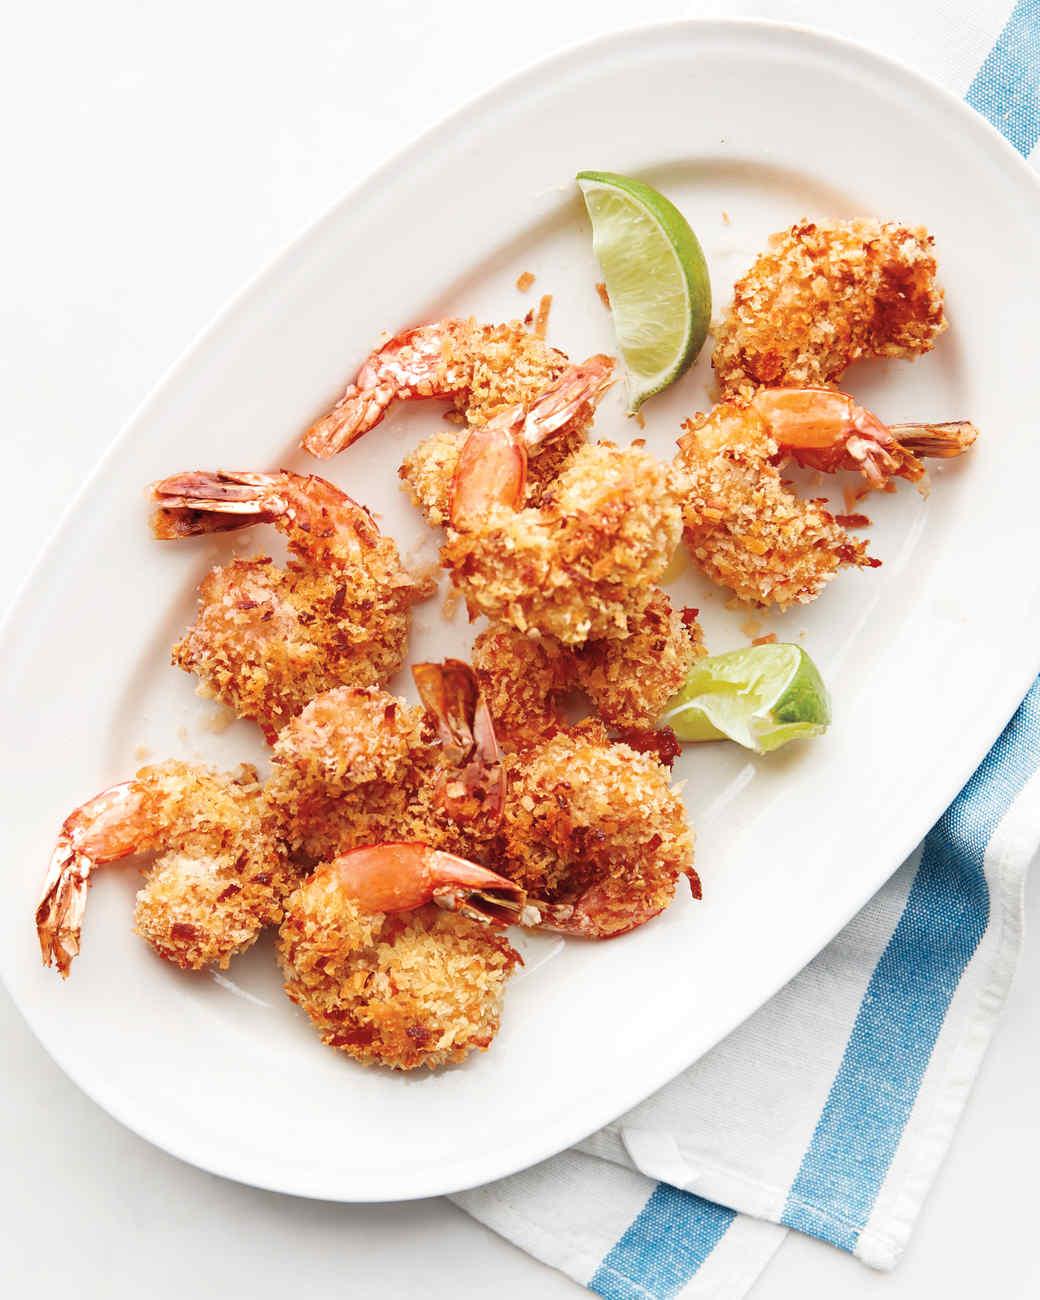 coconut-shrimp-029-med109951.jpg